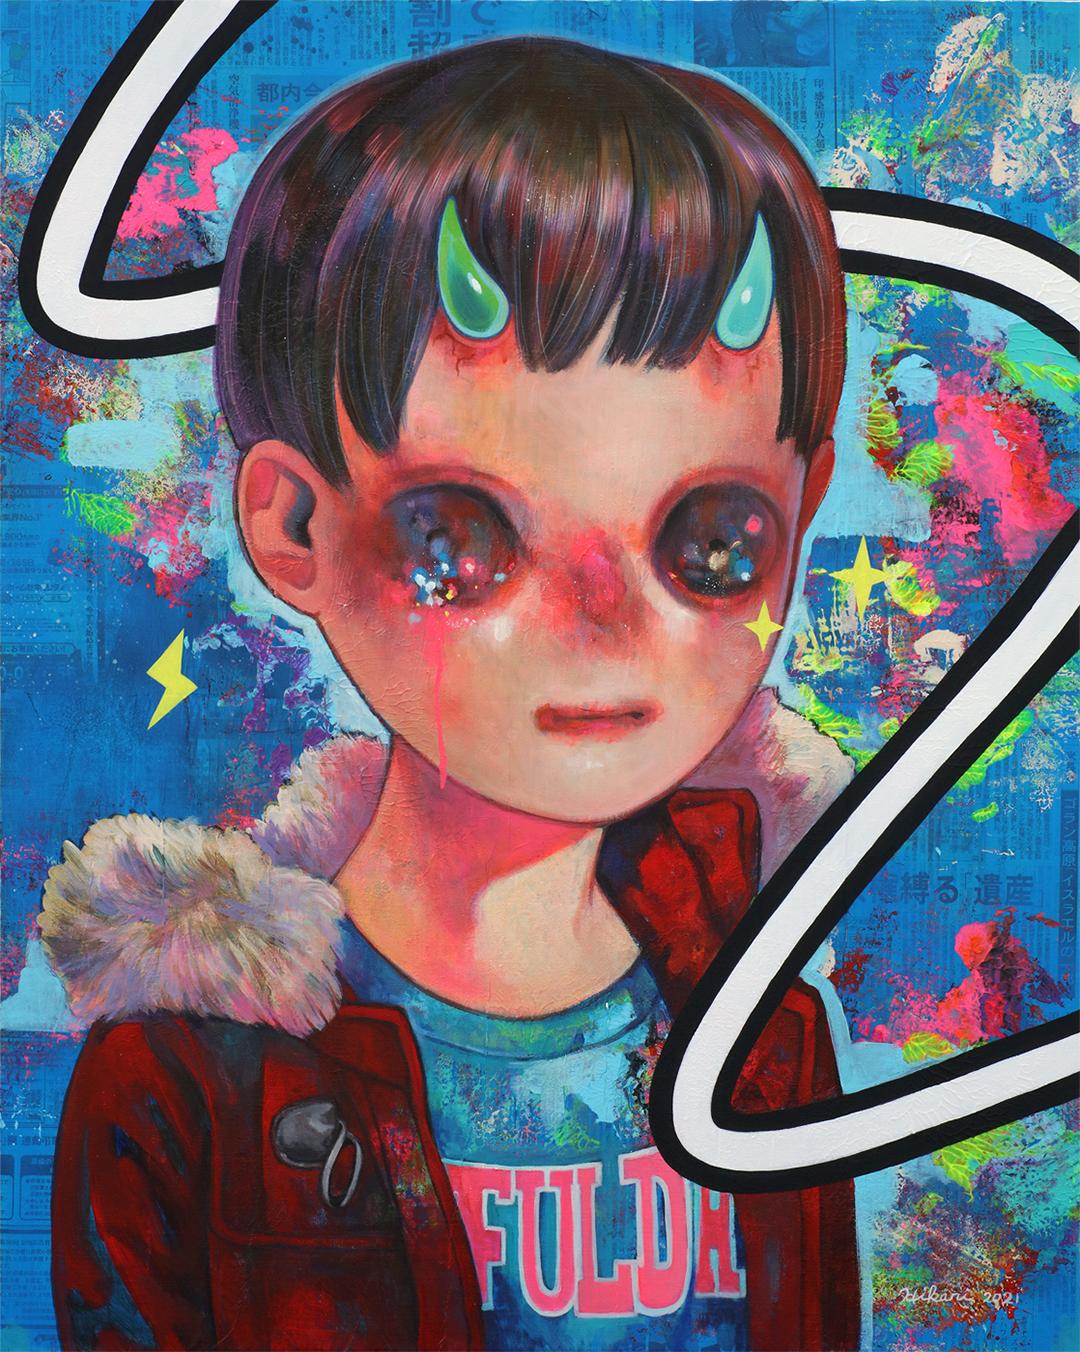 GirlsclubAsia-Artist-Hikari Shimoda_Living Now #1_Acrylic, oil and newspaper on canvas_35.8 x 28.6